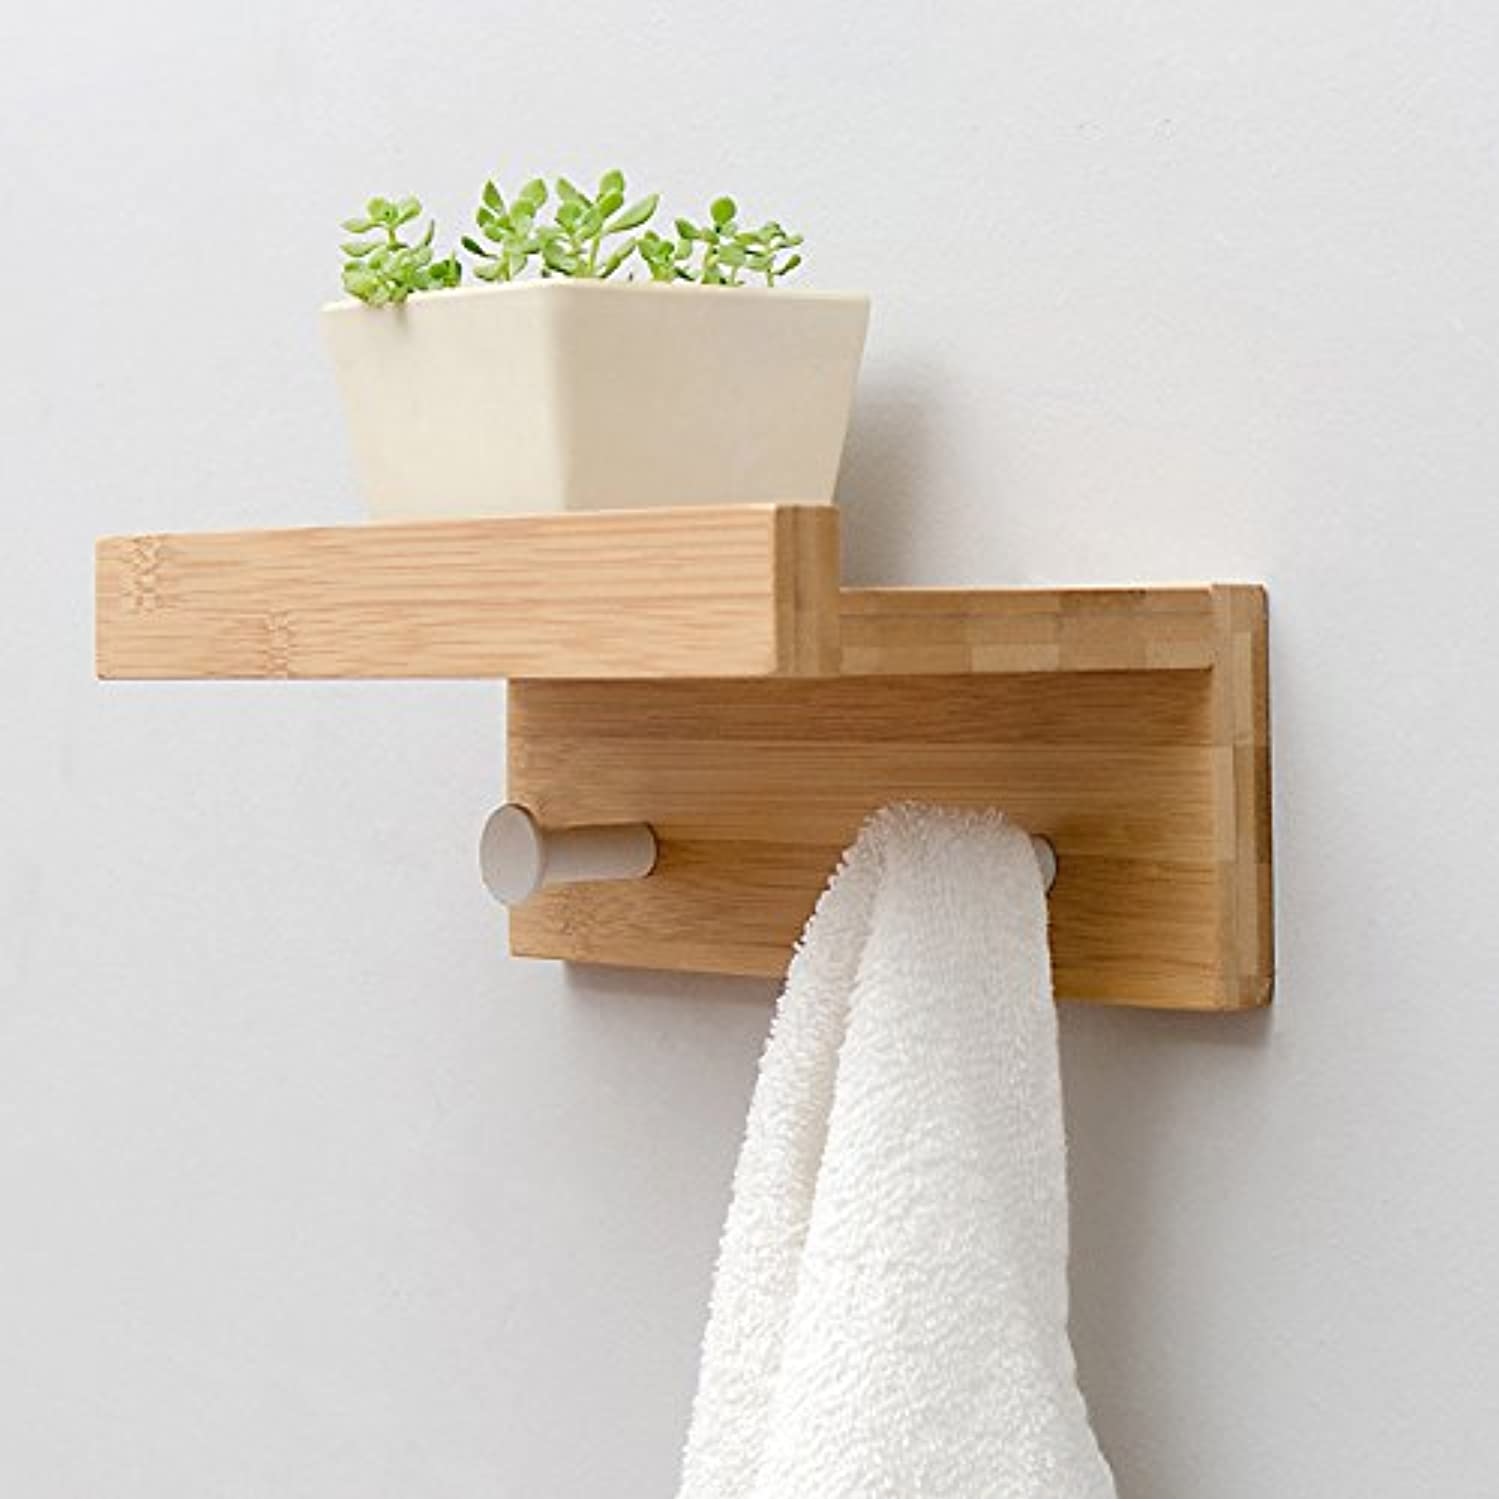 HU Living Room Wall Wood Shelf Creative Partition Wall-Mounted Hook Bathroom Towel Rack Decorative Frame Clothes Hook (Color:Wood Color, Black, White) (Color : Wood Color, Size : 3 Hooks)